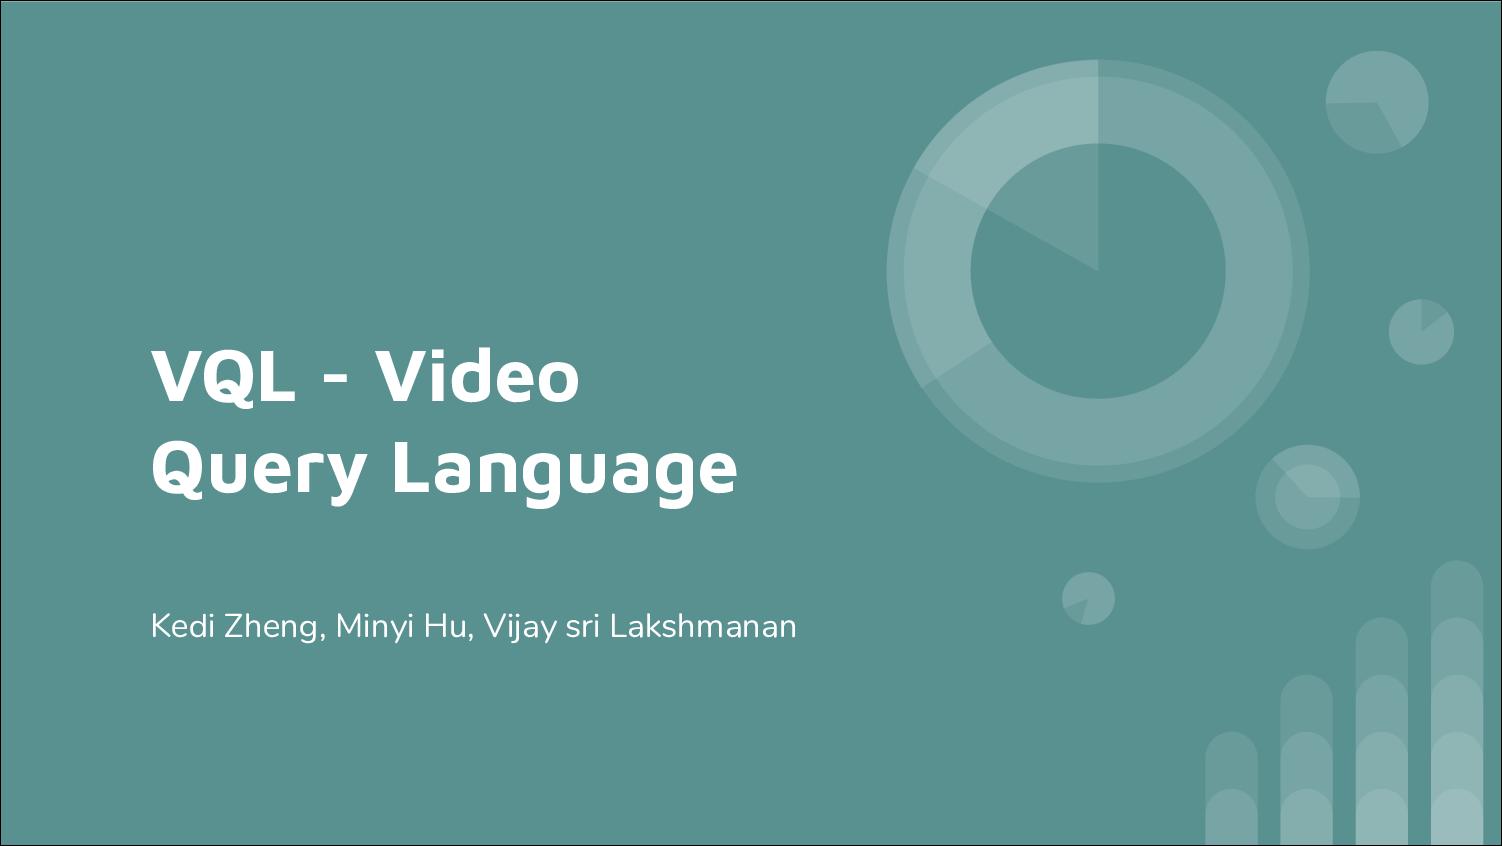 [PRESENTATION] VQL: Video Query Language